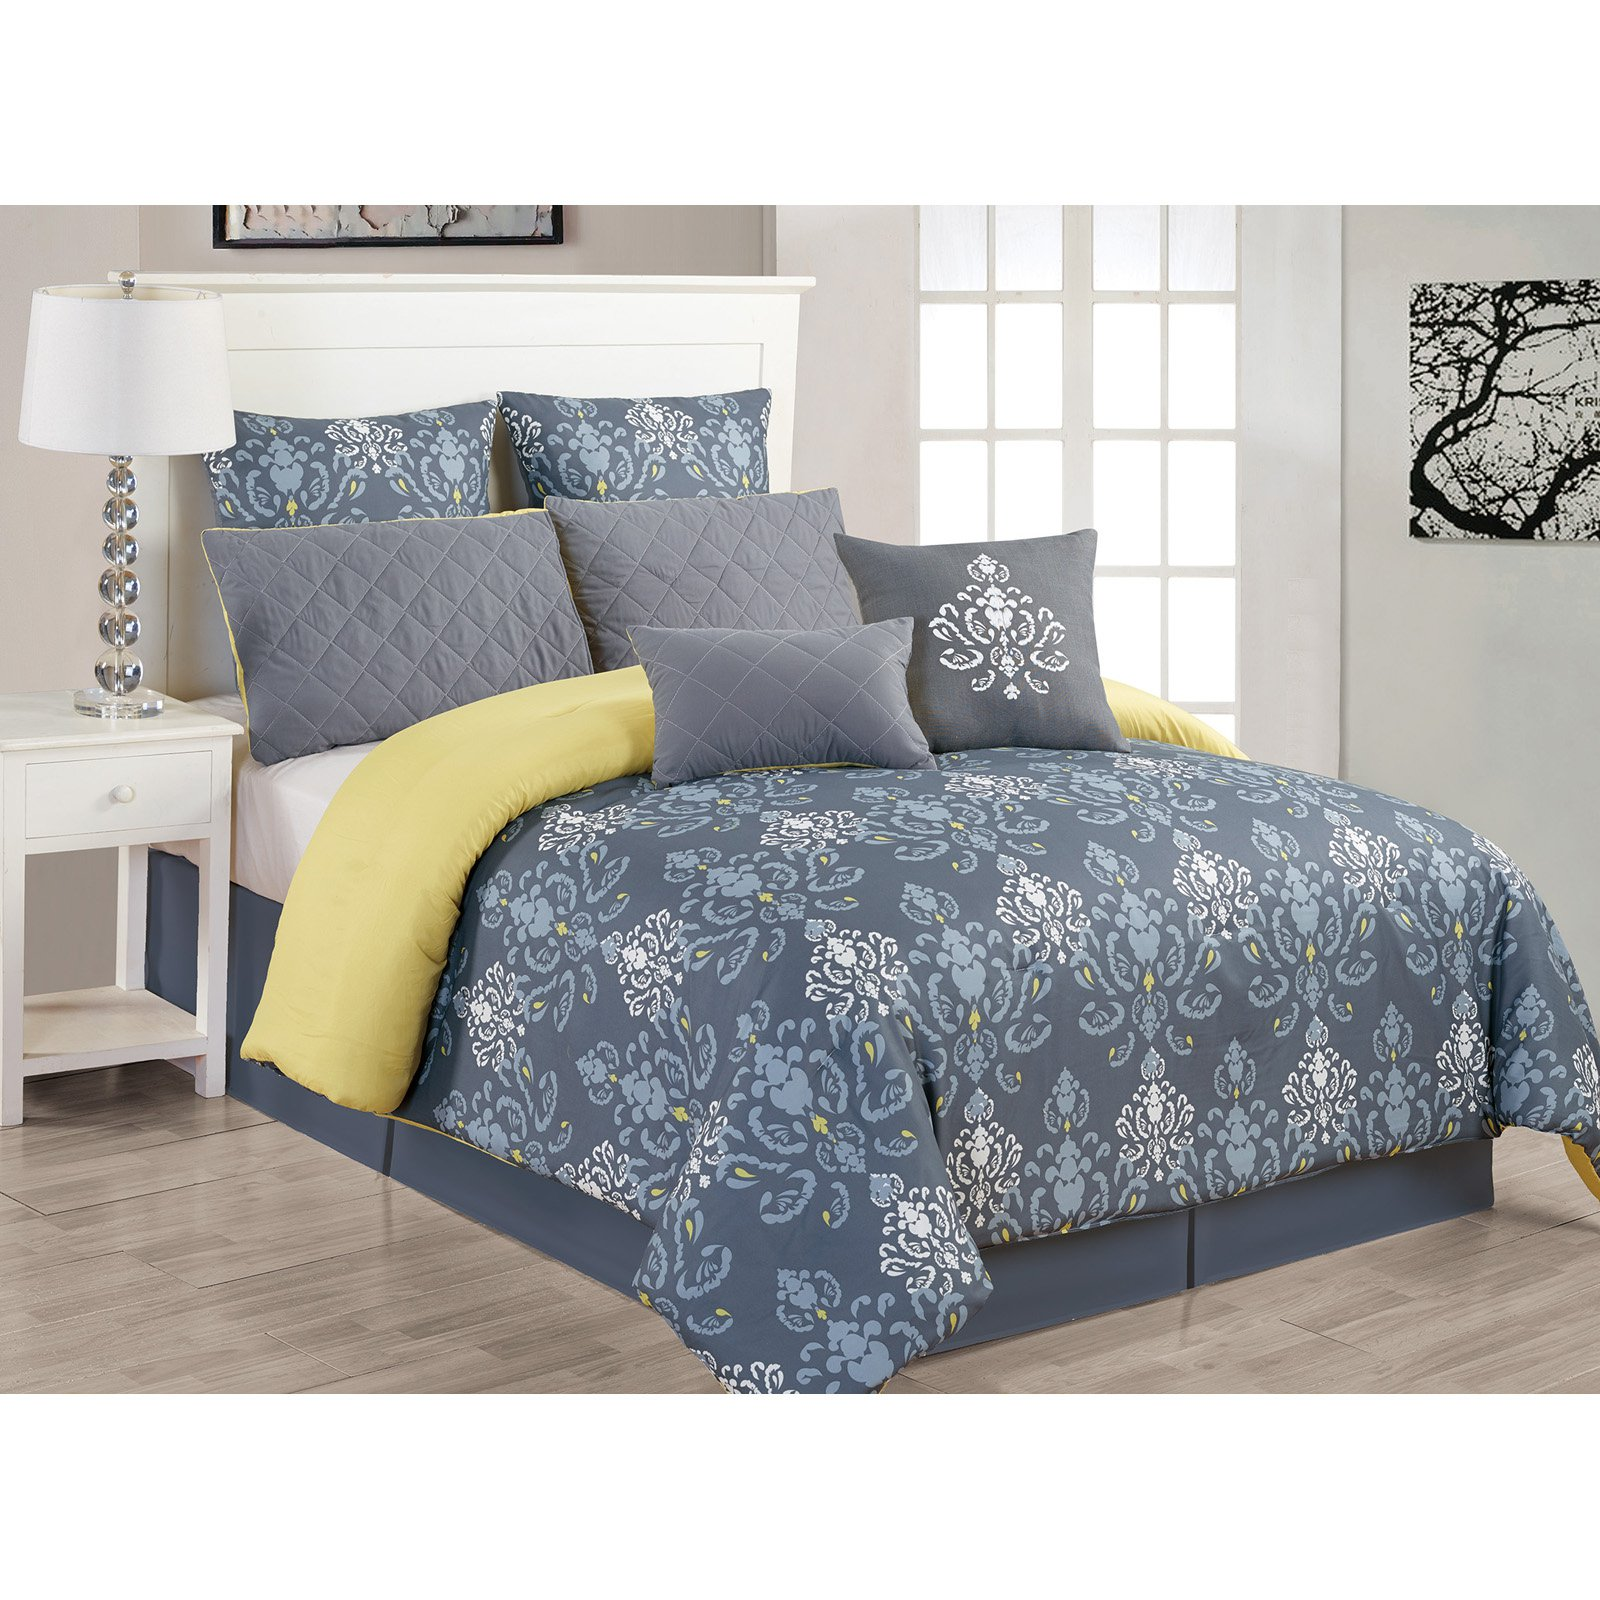 Lucienda 8 Piece Set Oversized/Over Filled Comforter Set by Duck River Textile